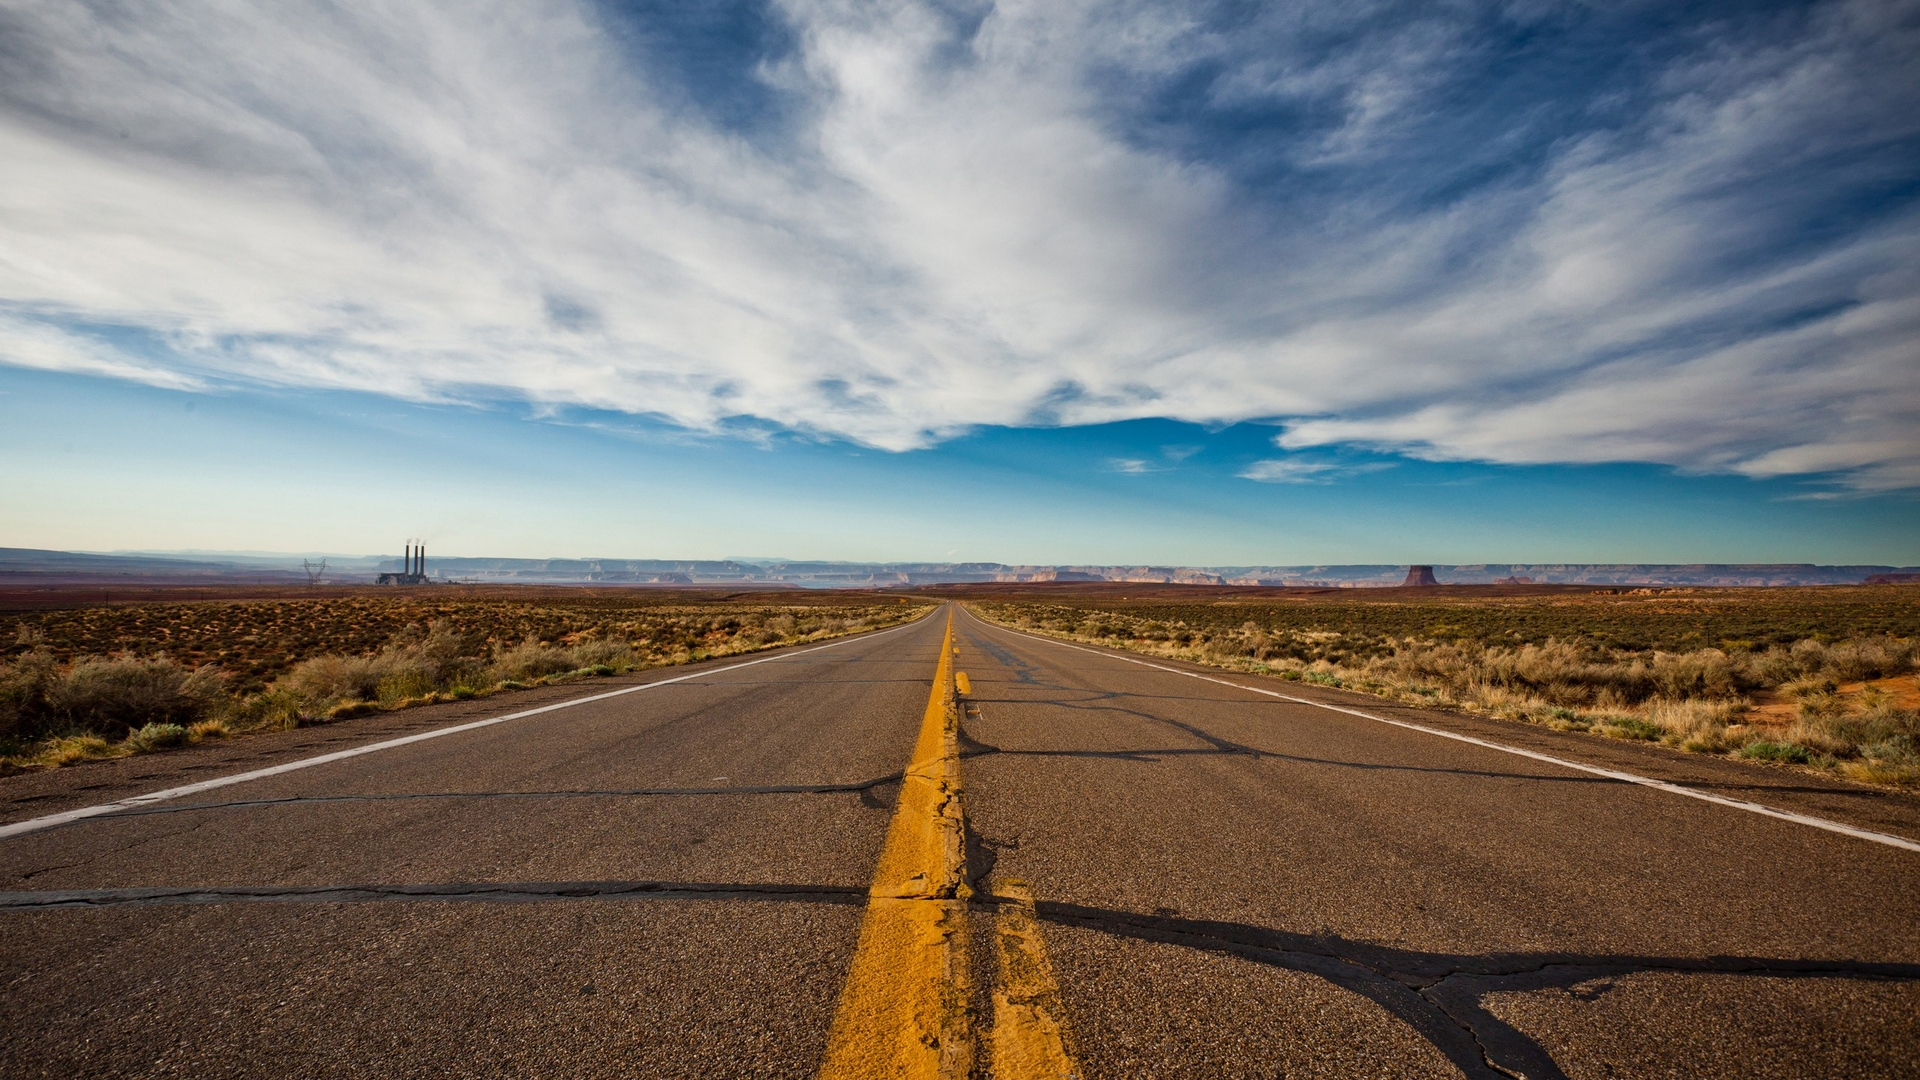 Поле горы дорога онлайн